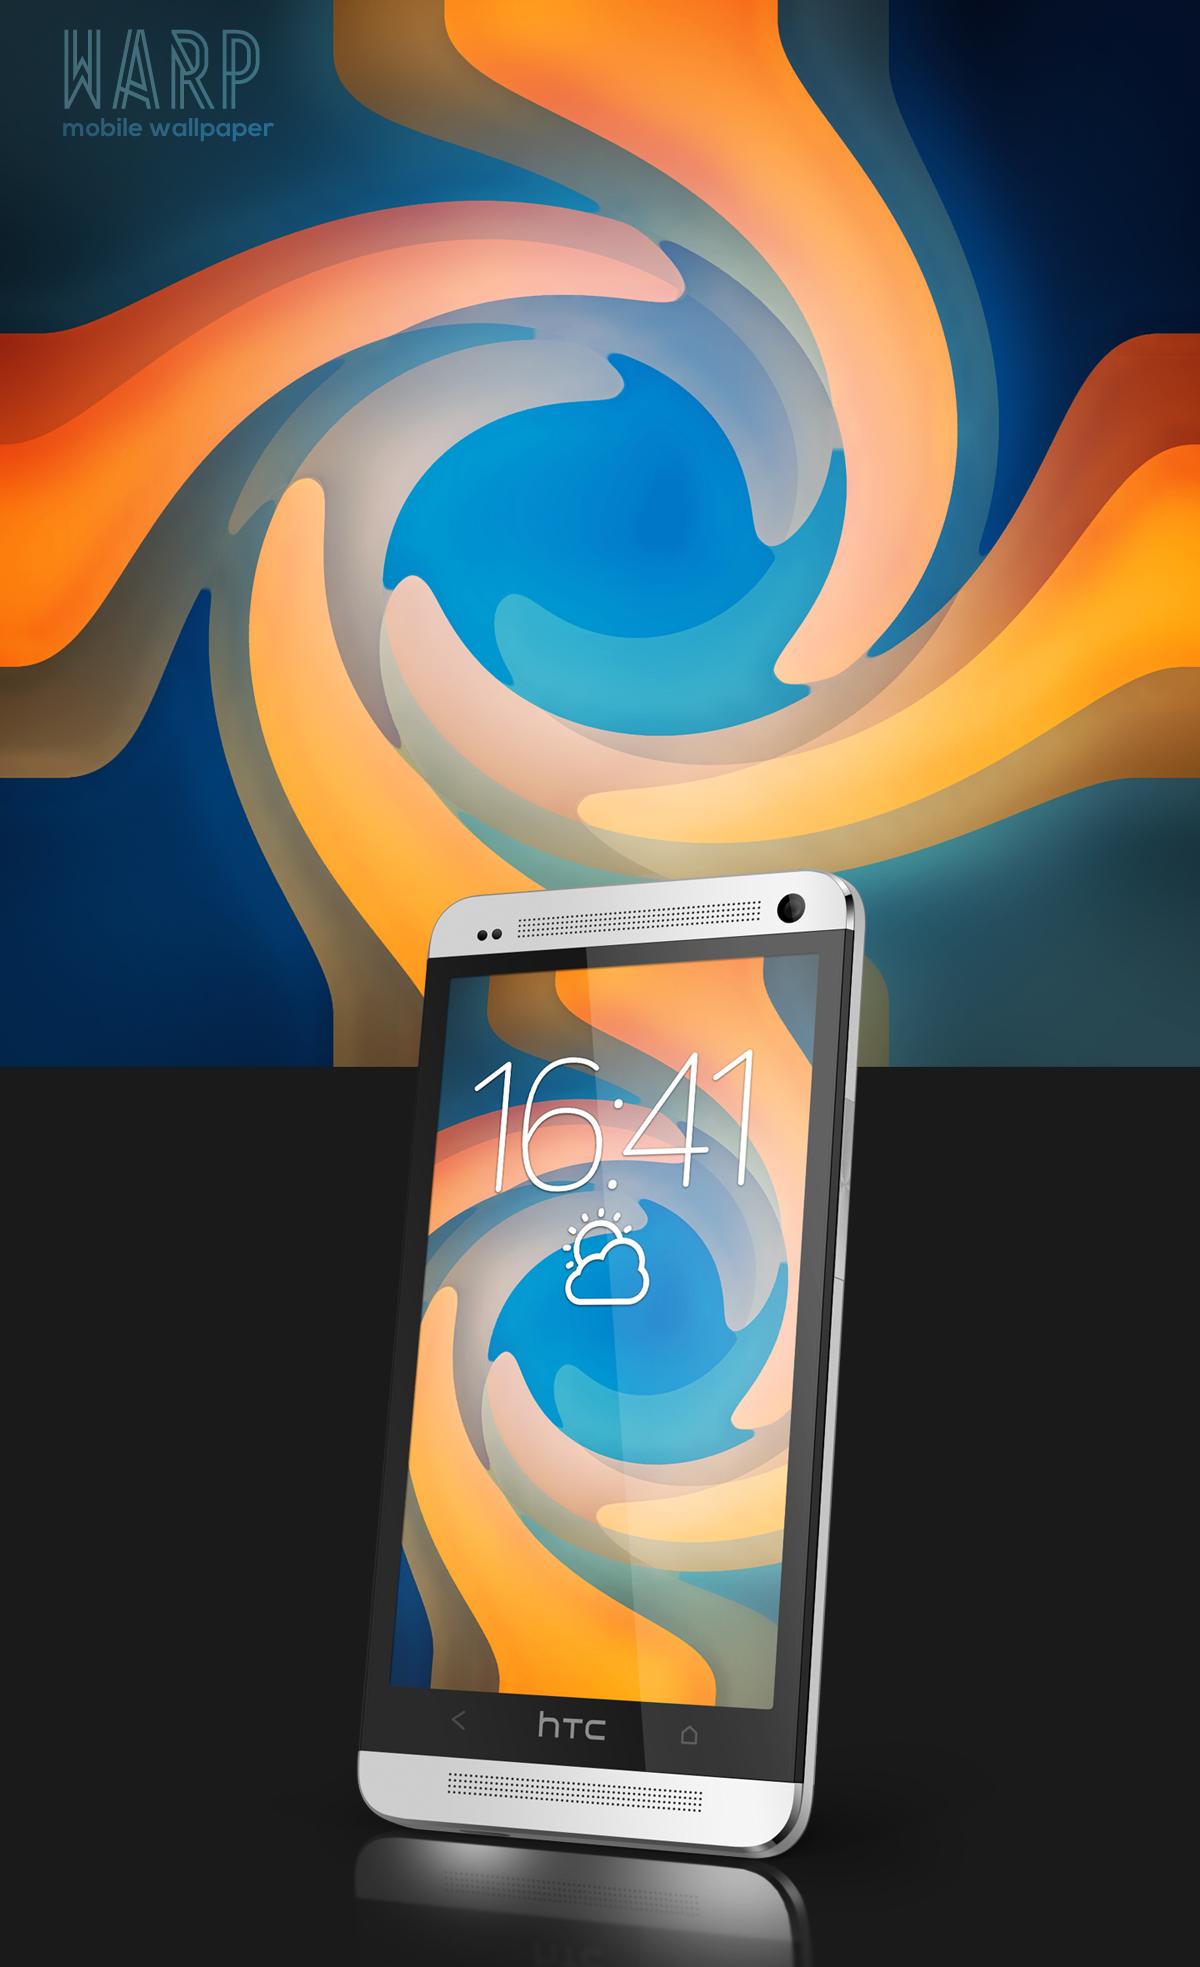 Warp Mobile Wallpaper by Martz90